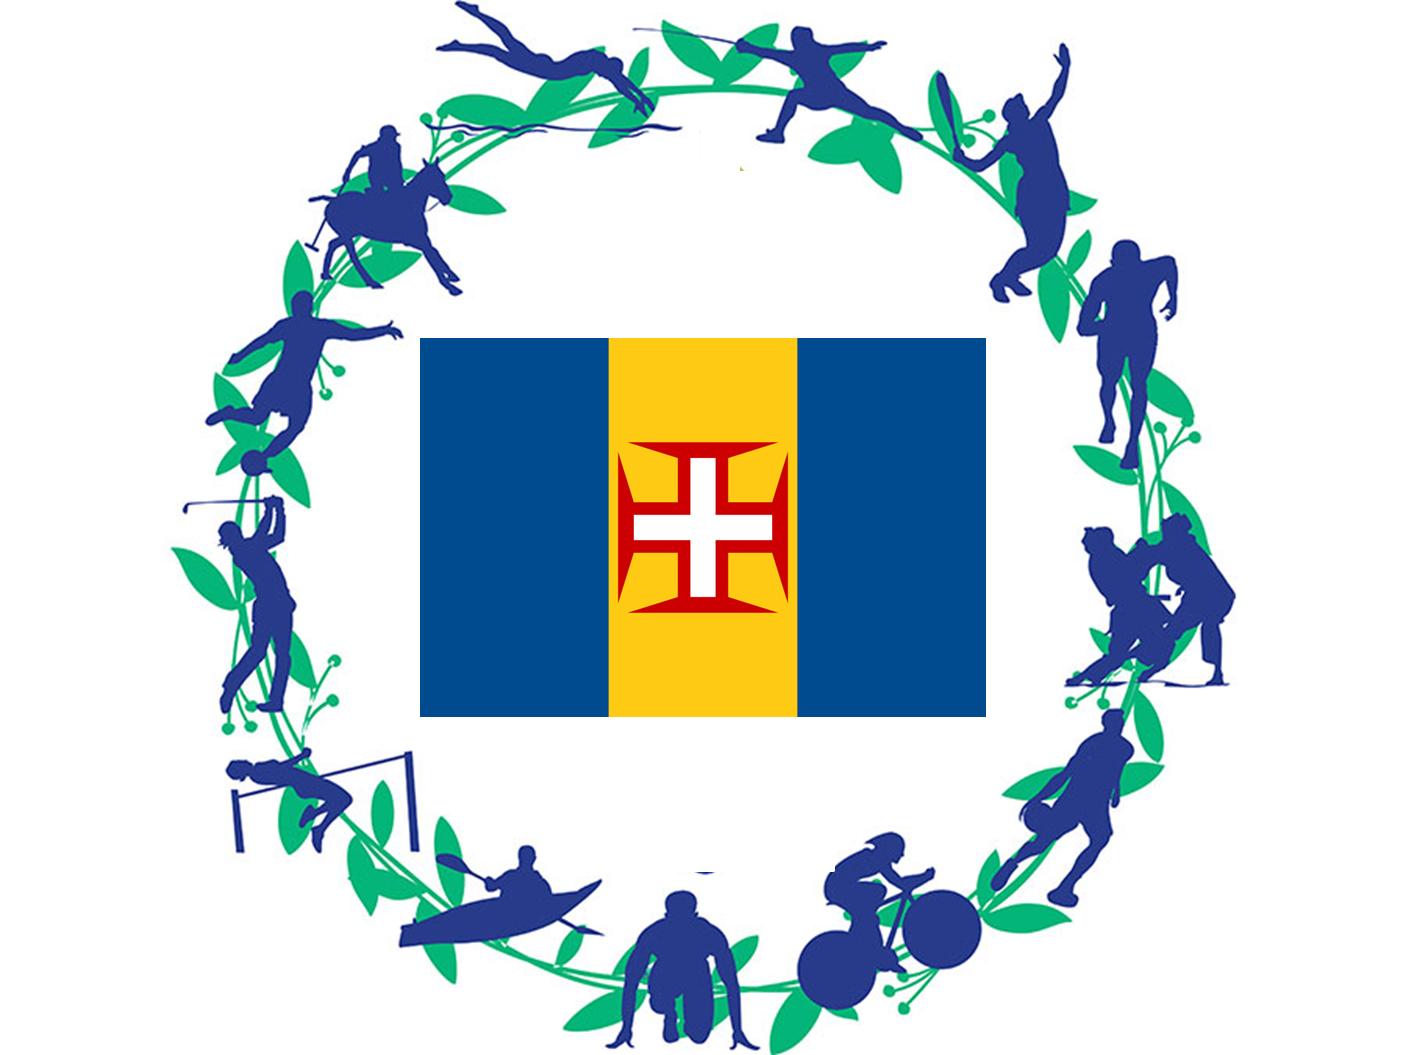 Plano Regional de Apoio ao Desporto 2018/2019